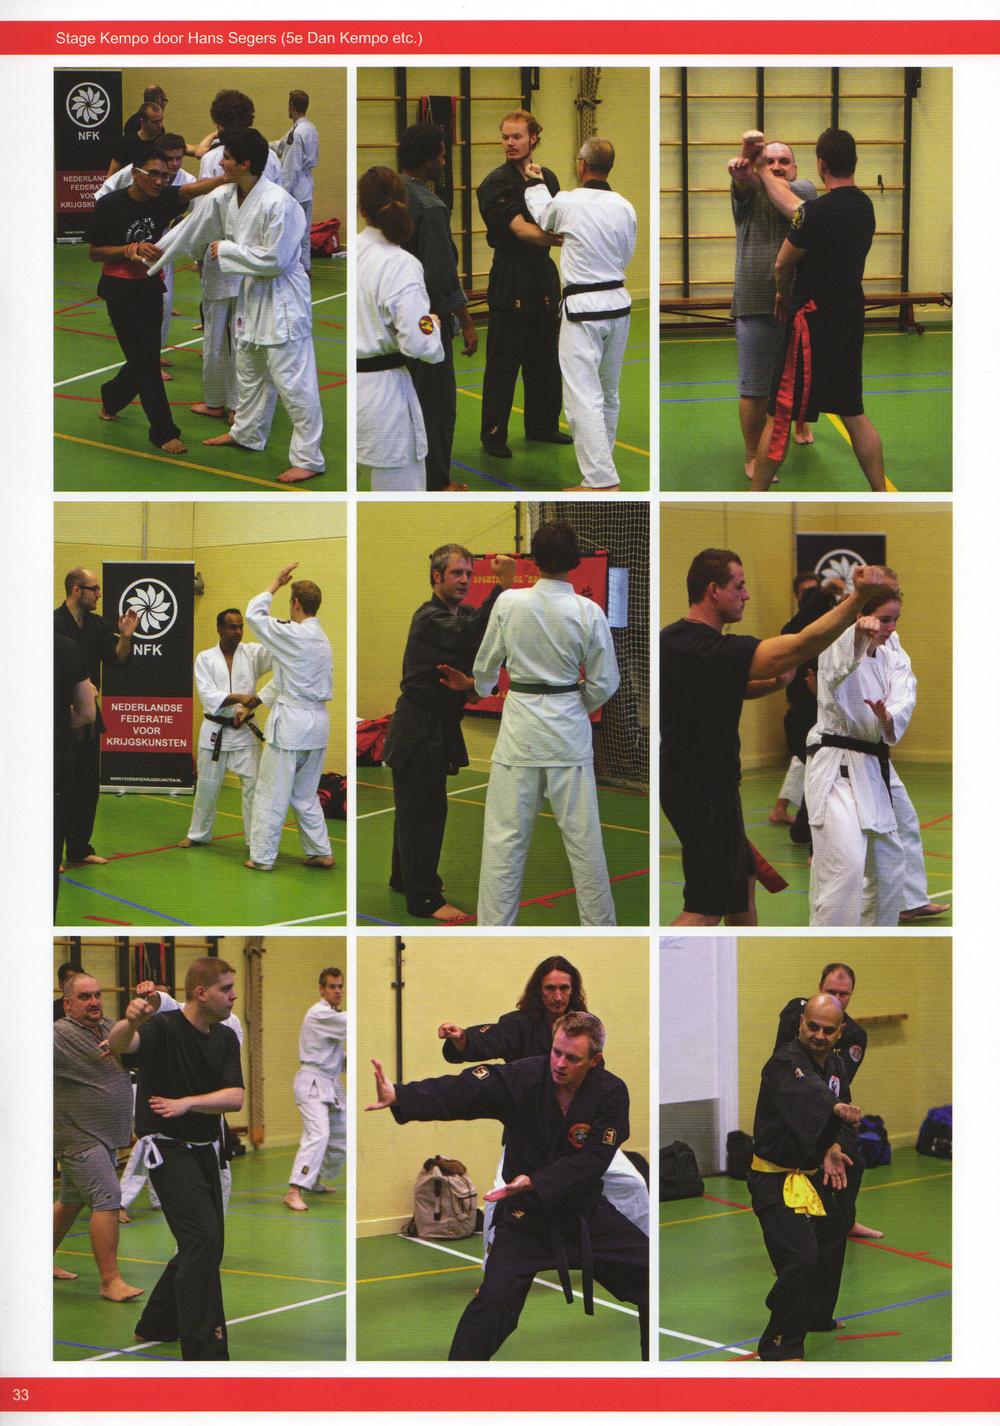 2012-11-04 NFK 7 Masters Martial Arts Festival Fotomagazine 2012 Pagina 33.jpg